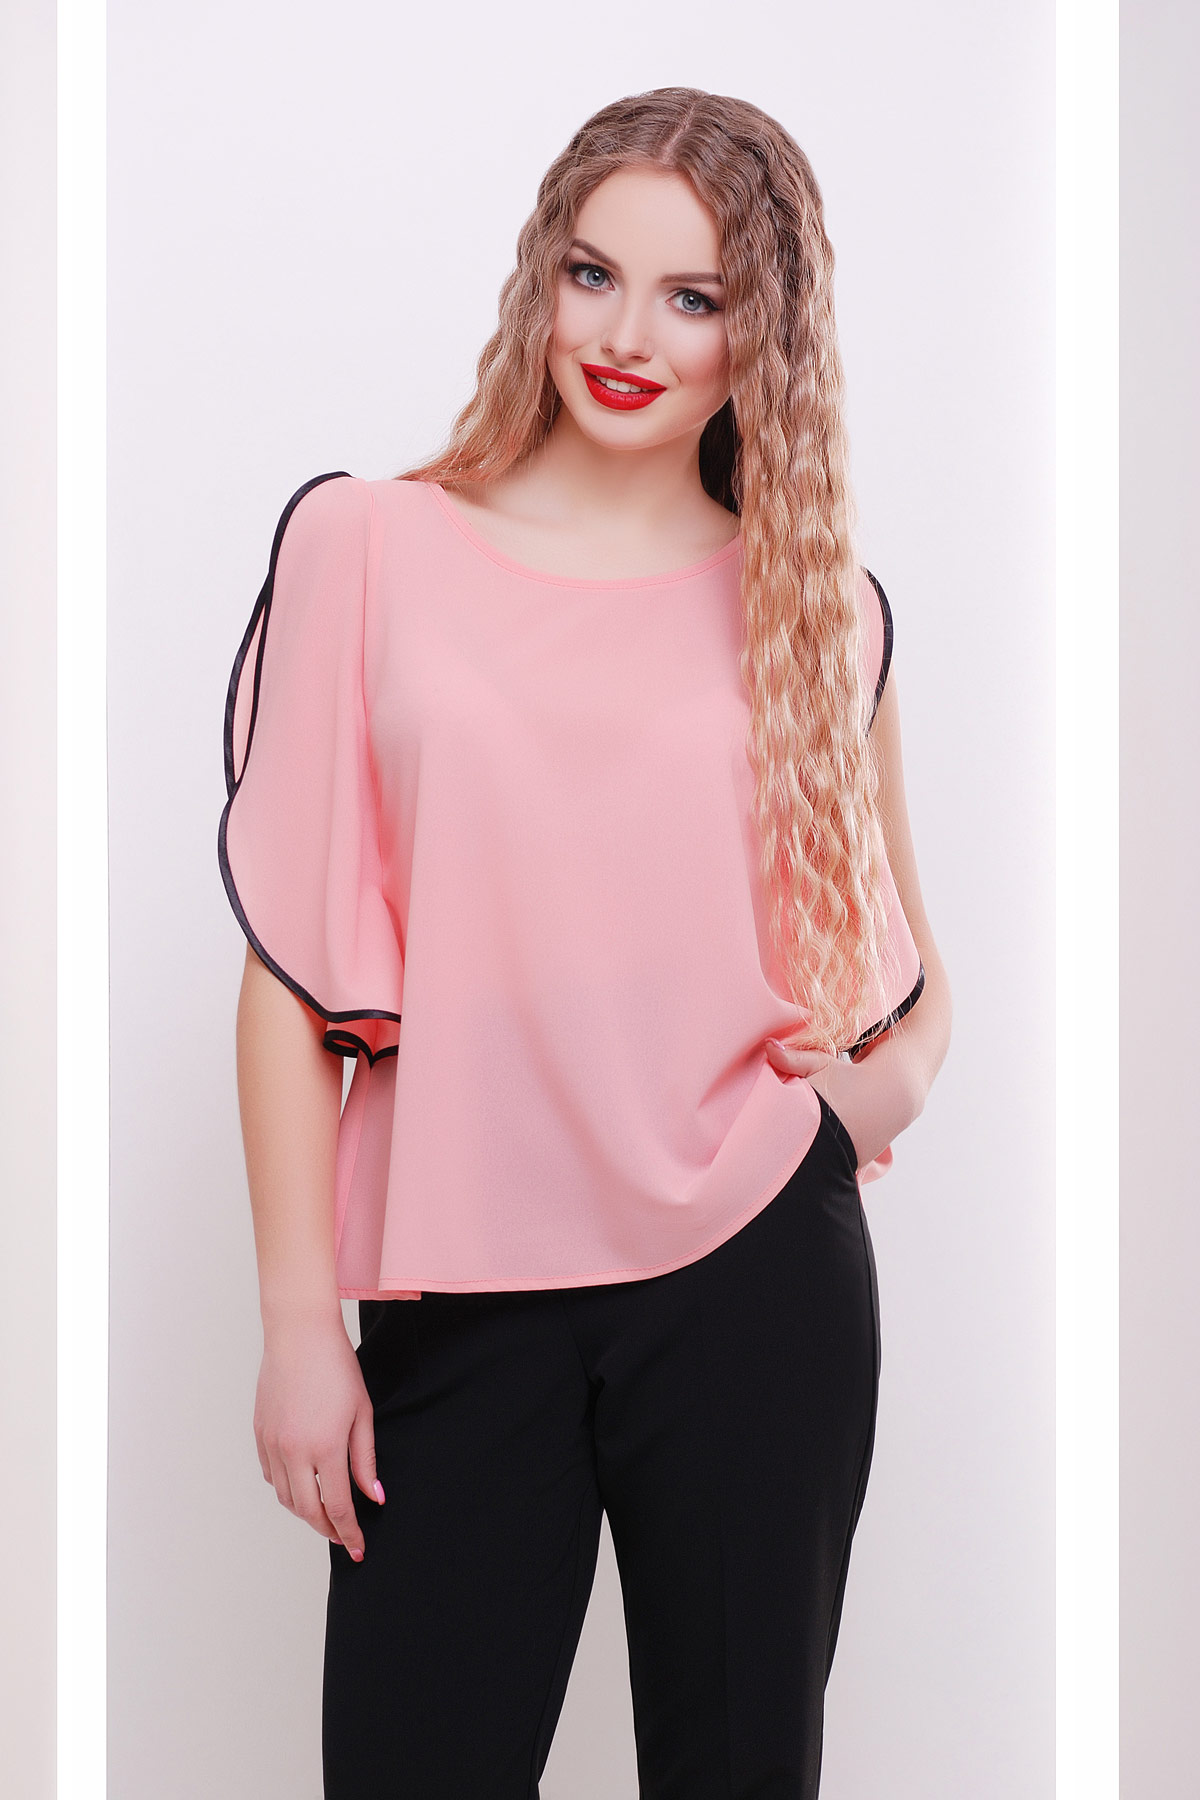 b9b5f925fc0 персиковая блузка свободного кроя. блуза Парма б р. Цвет  персик